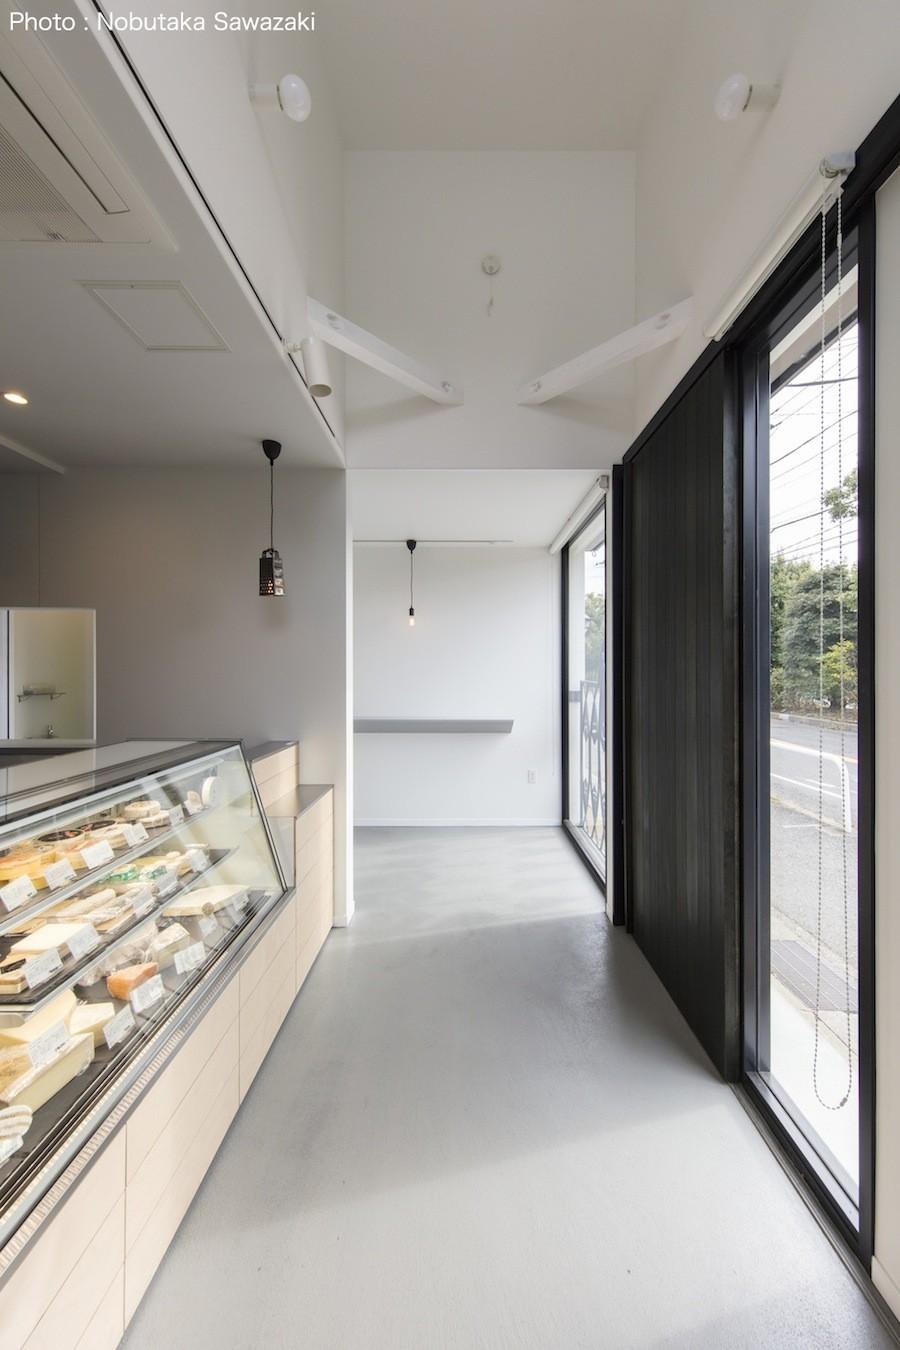 鎌倉の店舗併用住宅OUCHI-39 (1階店舗)